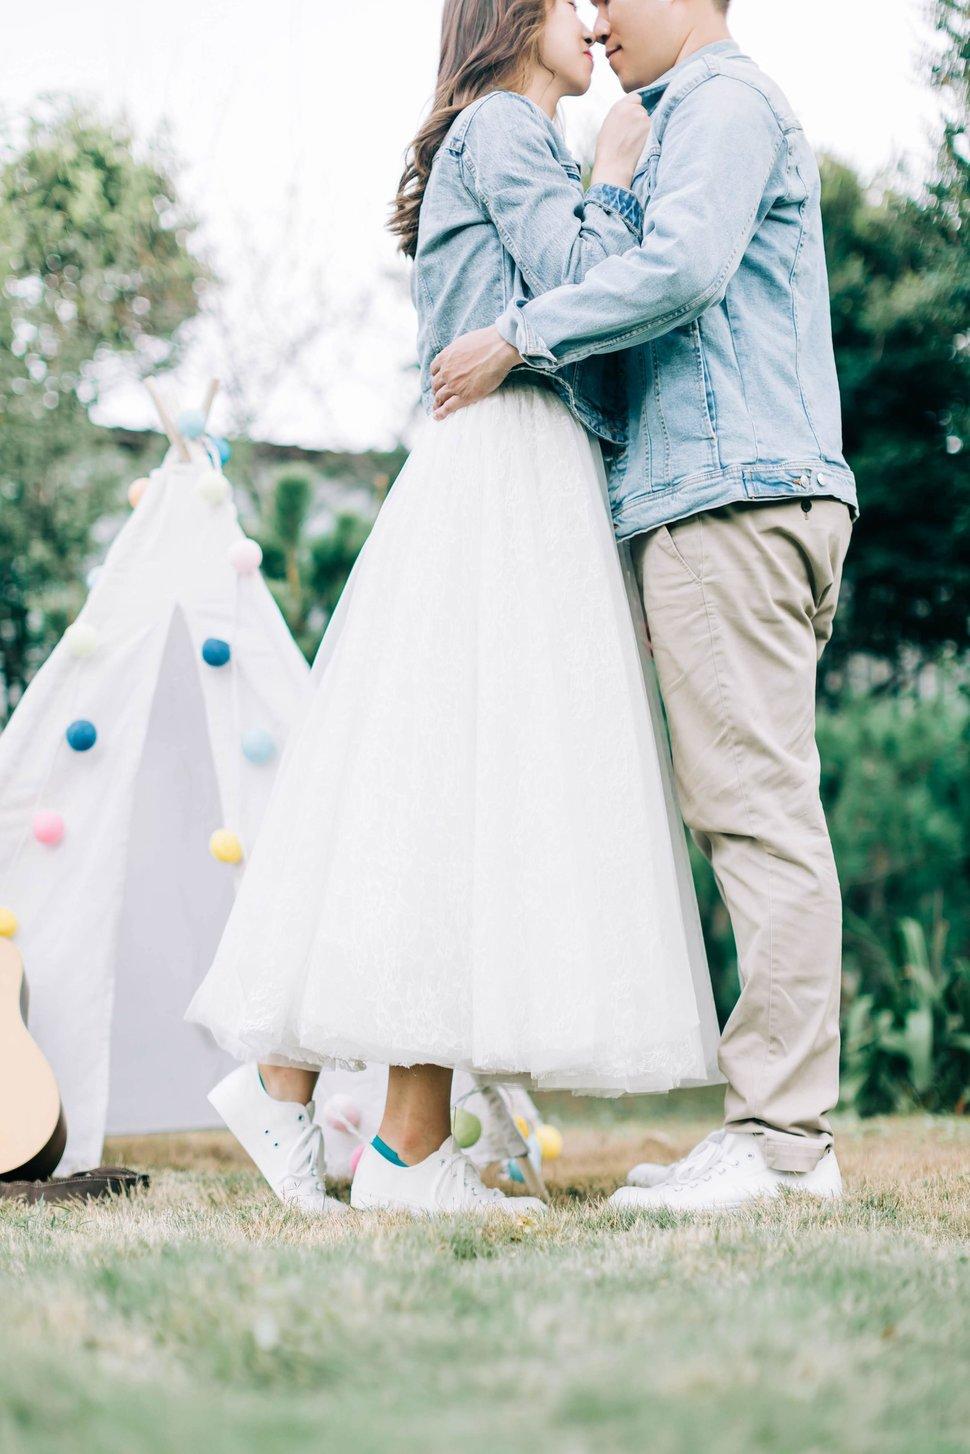 AG3_7218A - Cradle Wedding搖籃手工婚紗《結婚吧》